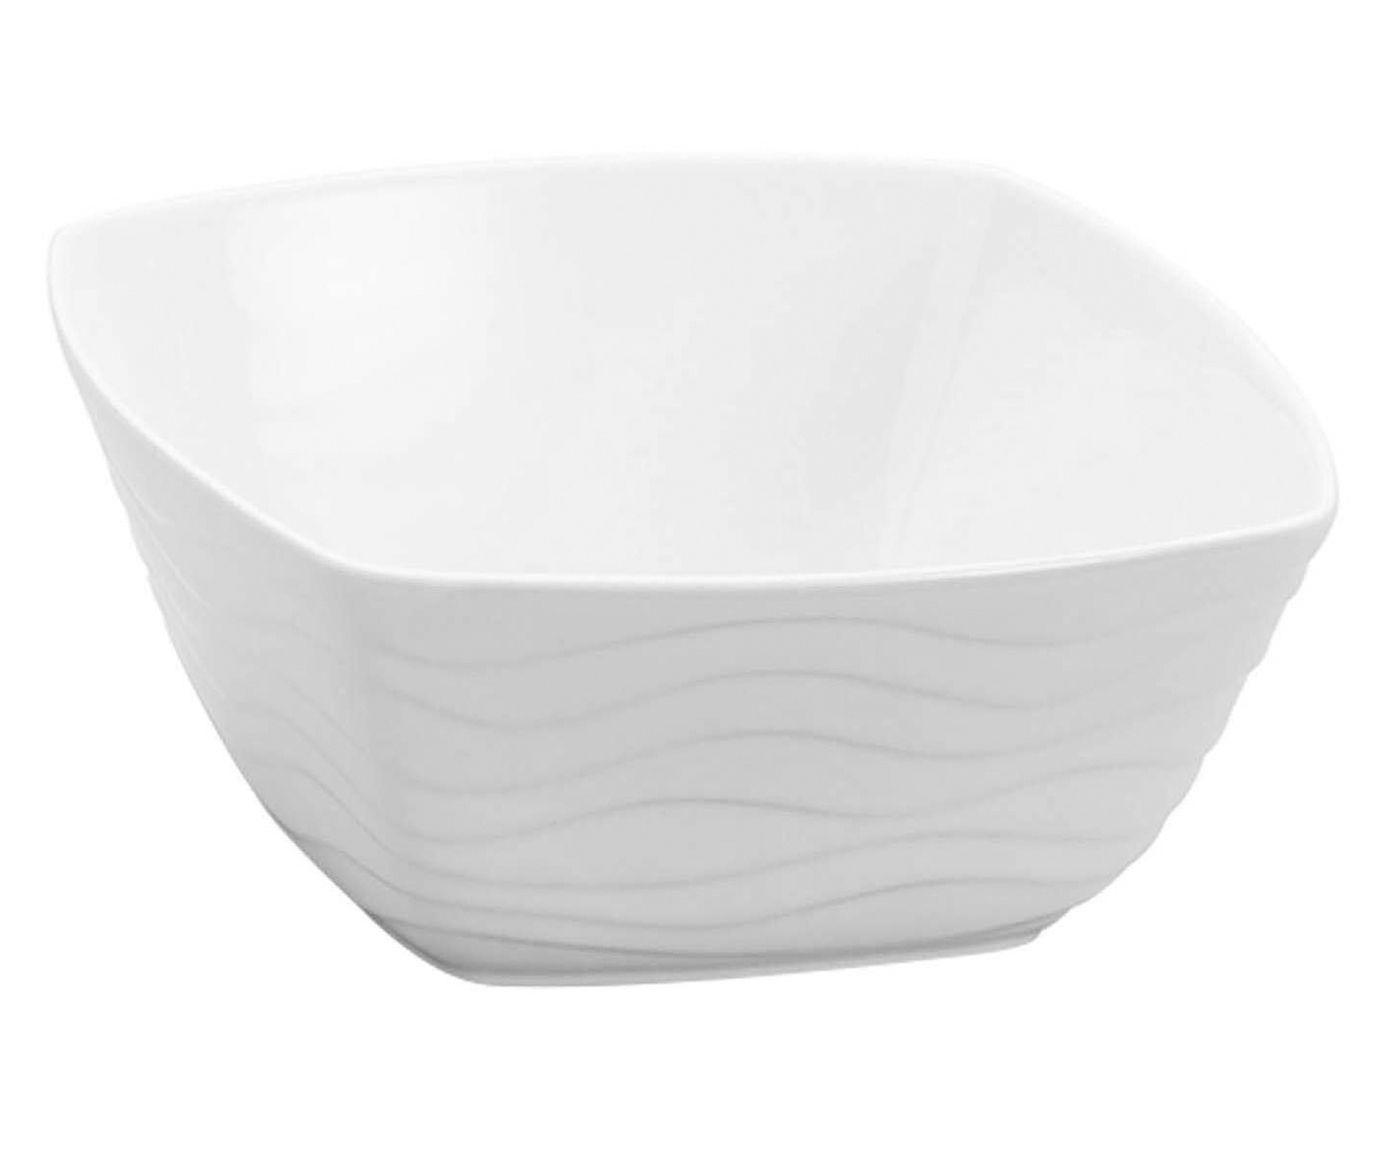 Saladeira Just - 20,5x20,5cm | Westwing.com.br